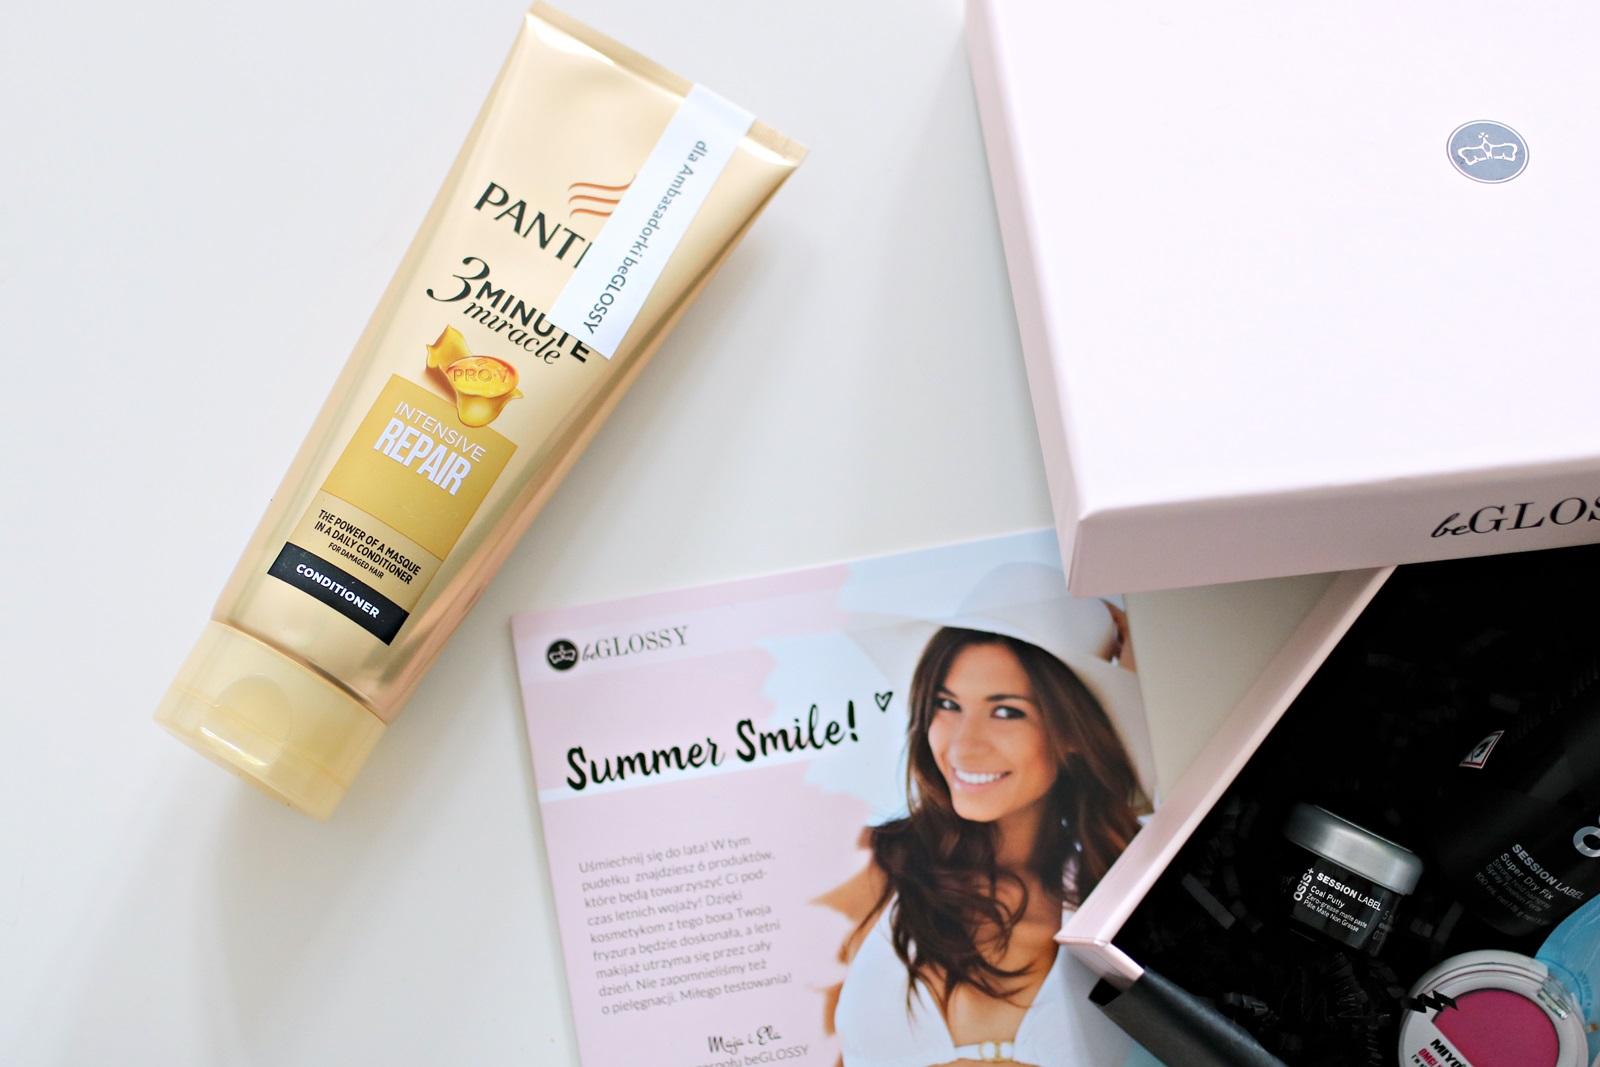 beGLOSSY Summer Smile {przegląd pudełka siepień 2017} - PANTENE